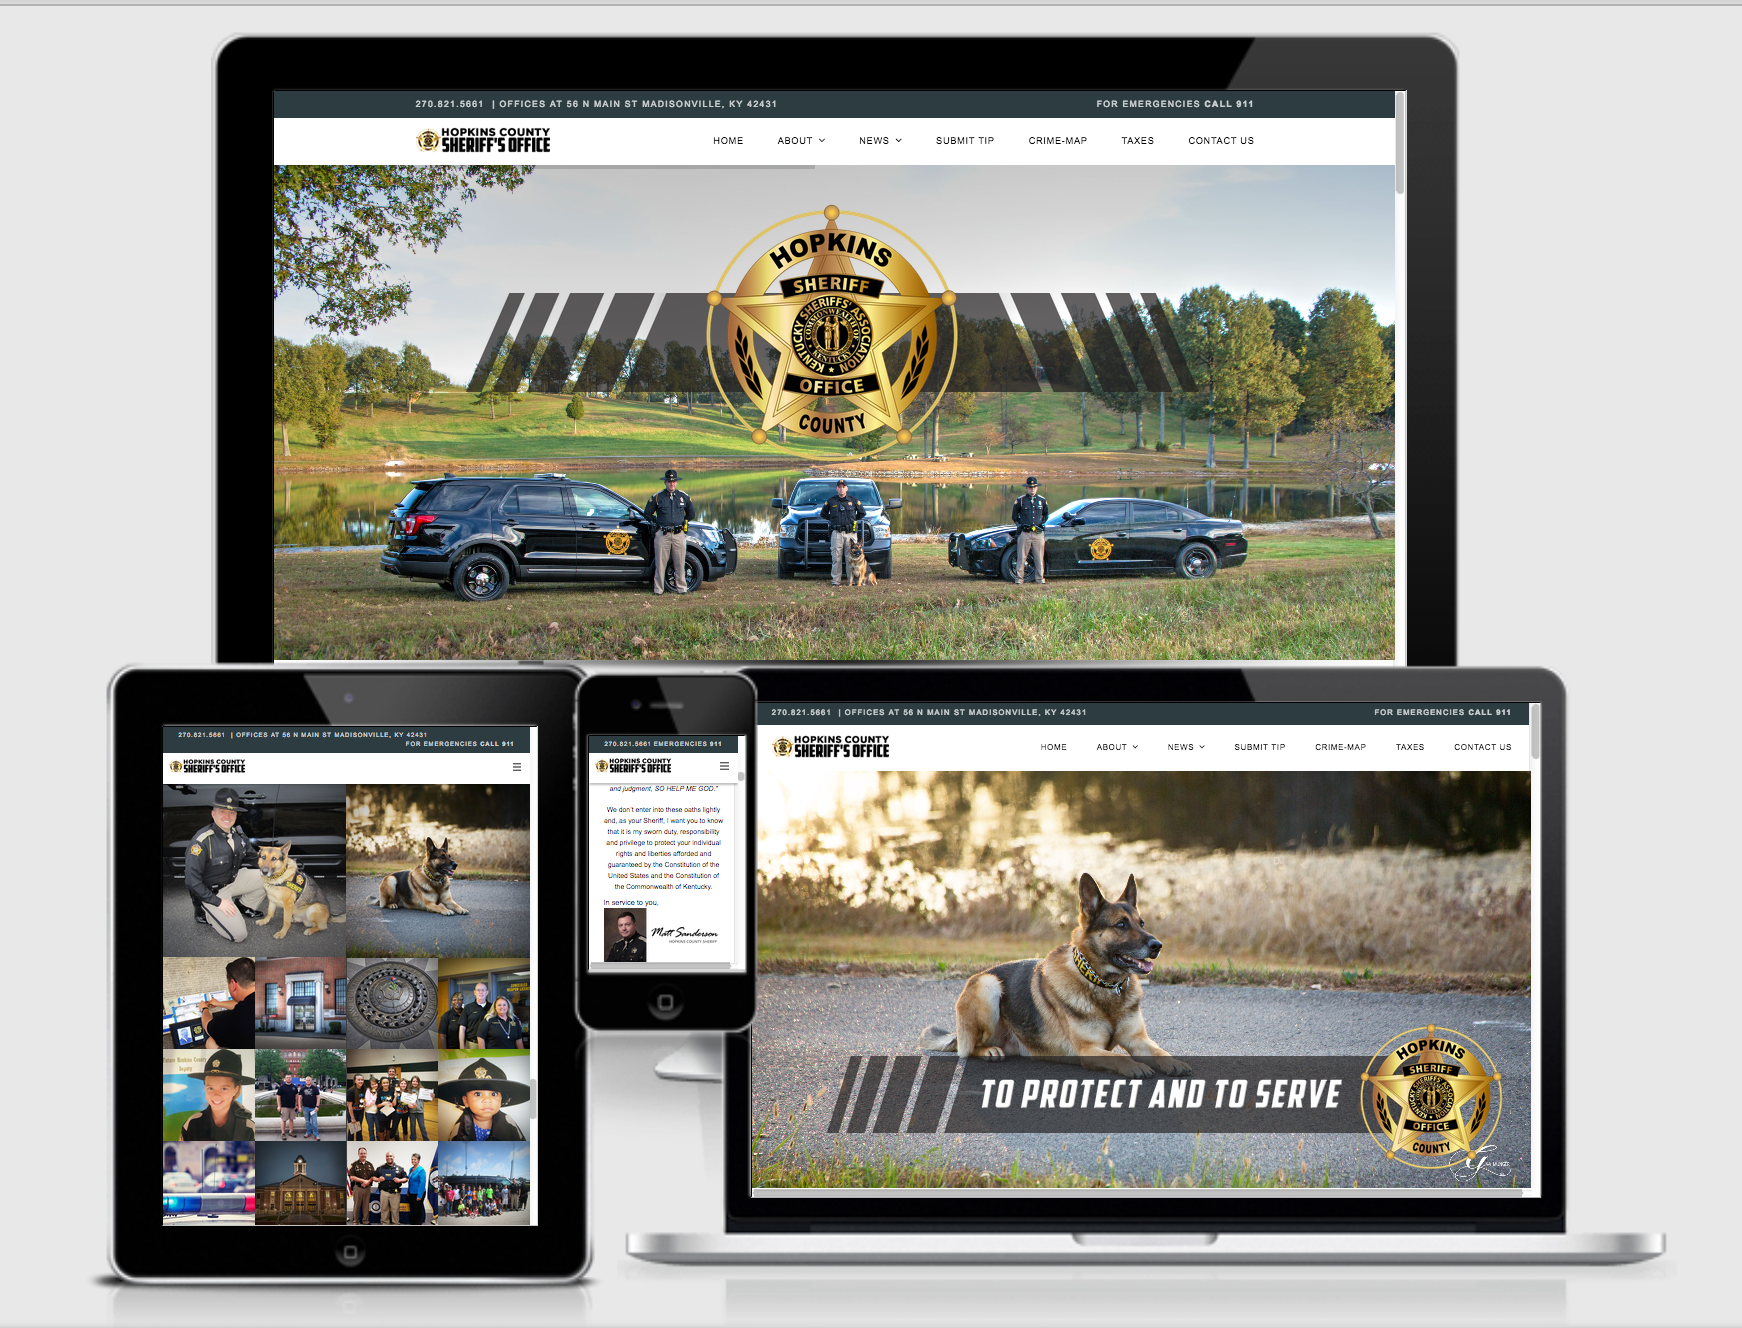 Hopkins County Sheriff Website image